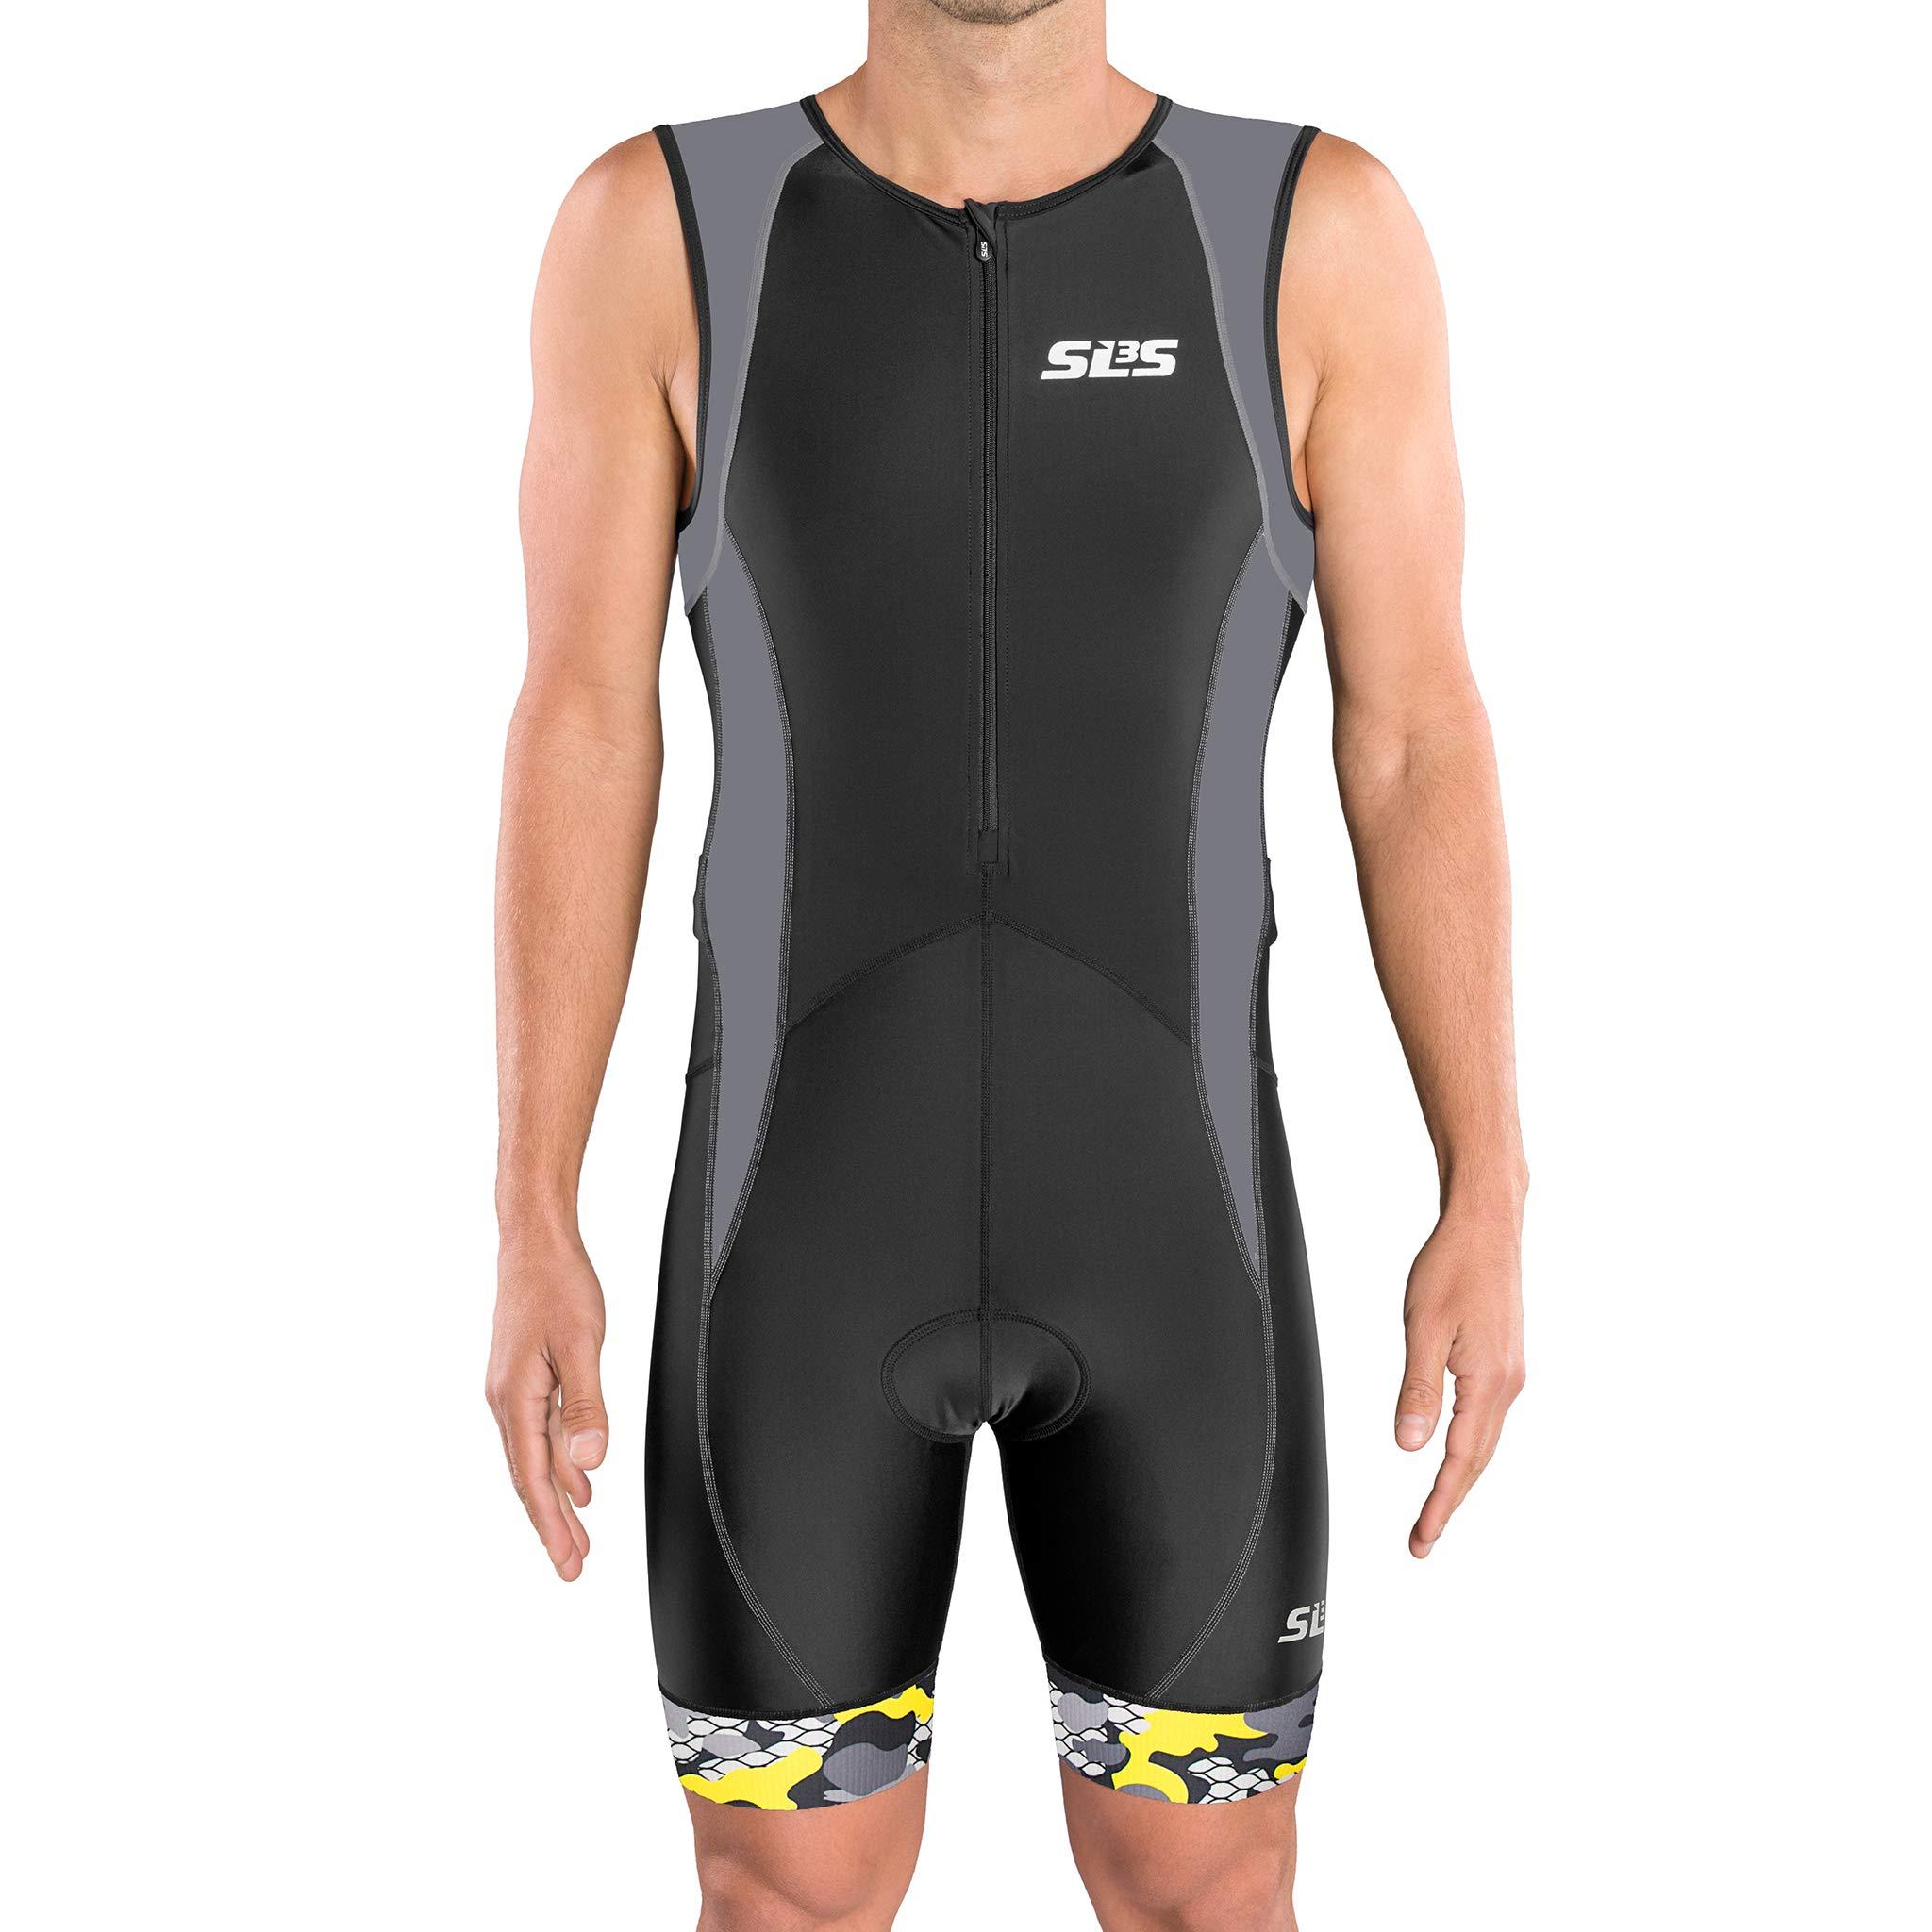 SLS3 Men`s Triathlon Tri Suit FX | Trisuit | 2 Pockets | Soft Custom Chamois | German Designed (Black/Gray, S)